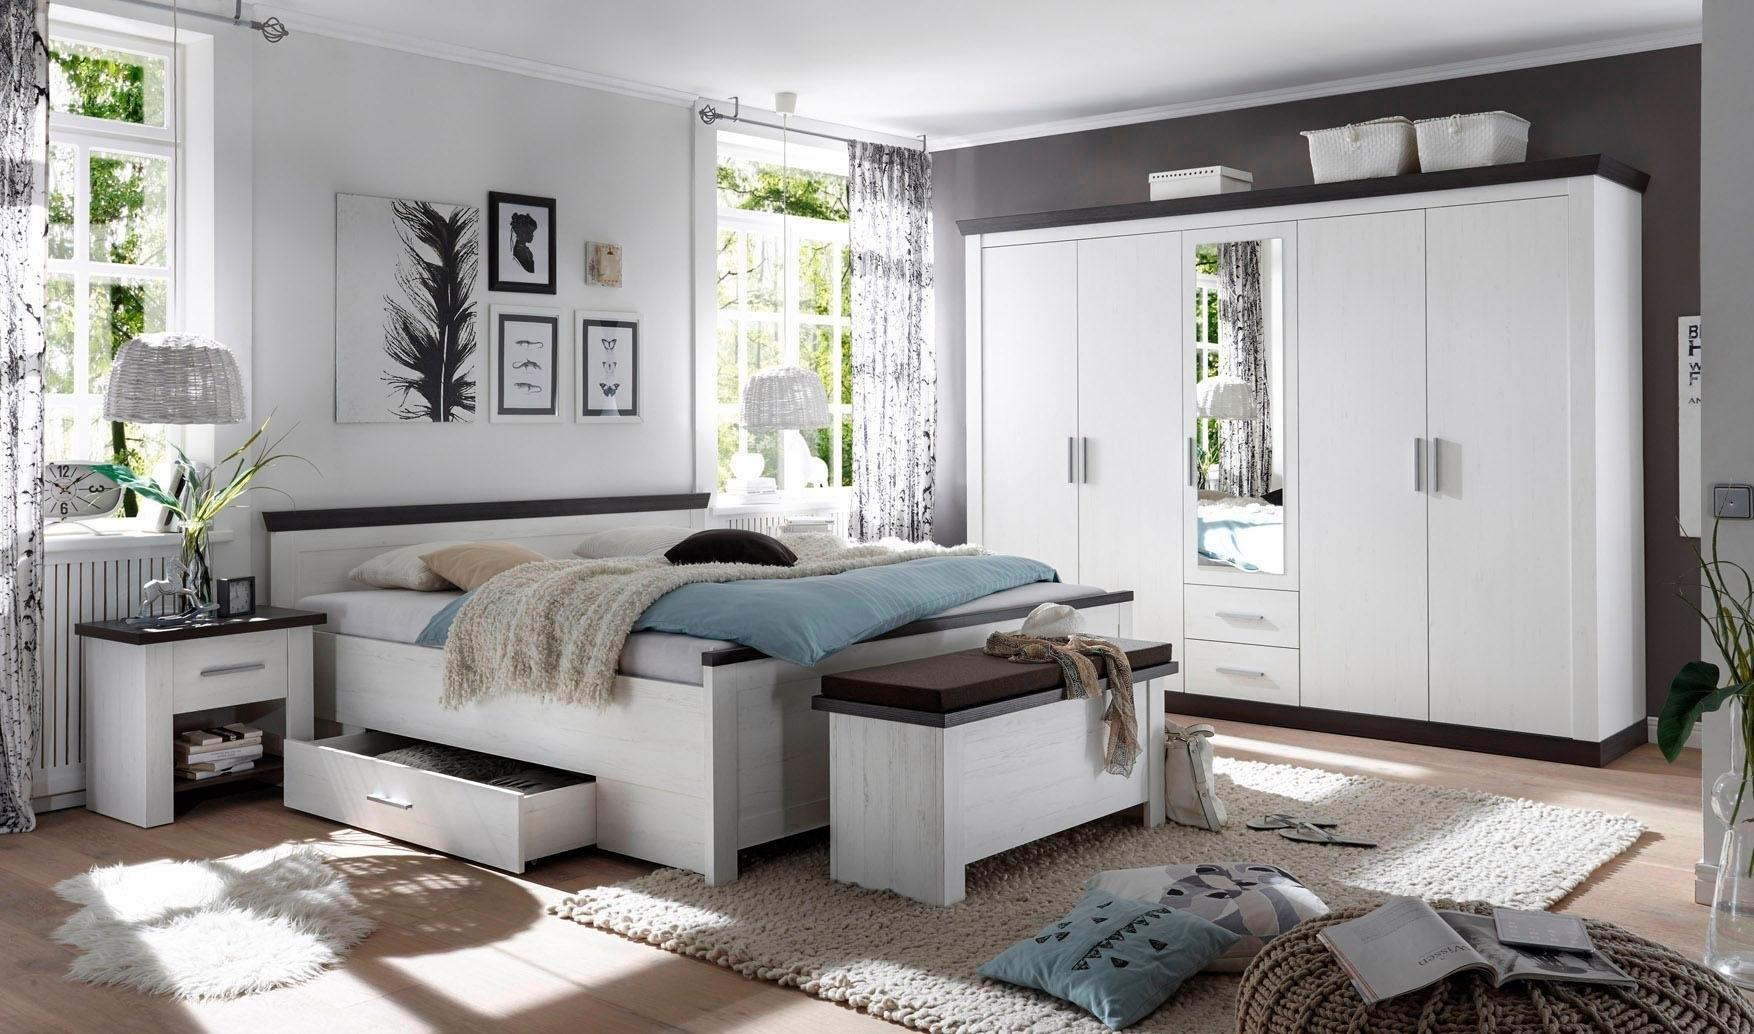 Home affaire slaapkamerserie Siena 5-deurs kledingkast, bed 180 cm, 2 nachtkastjes (set, 4 stuks) veilig op otto.nl kopen